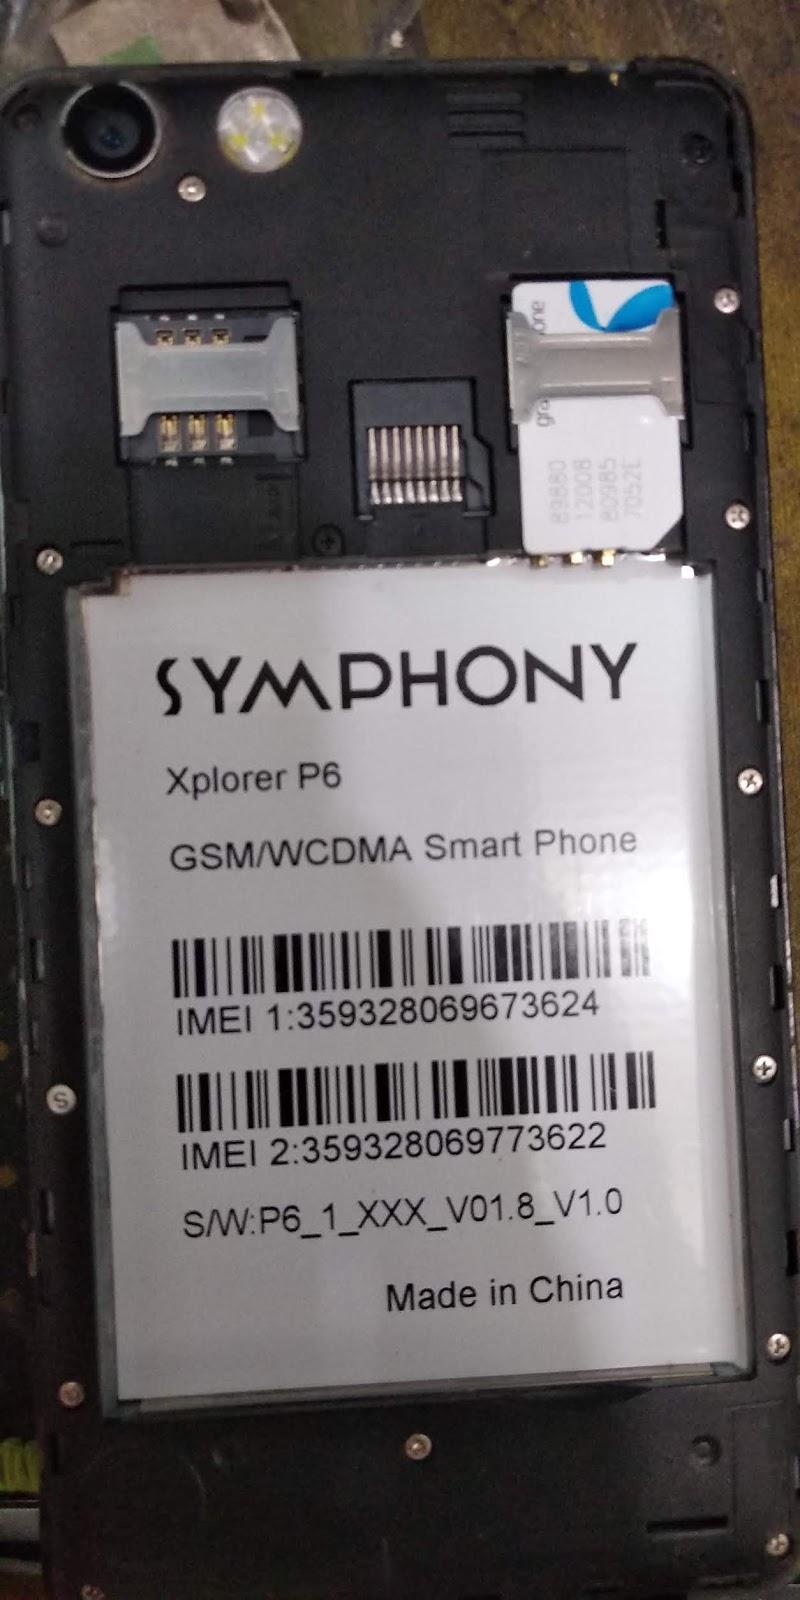 Symphony MT6582 P6__5 0 1GB FLASH FILE CM2 READ 100% tested